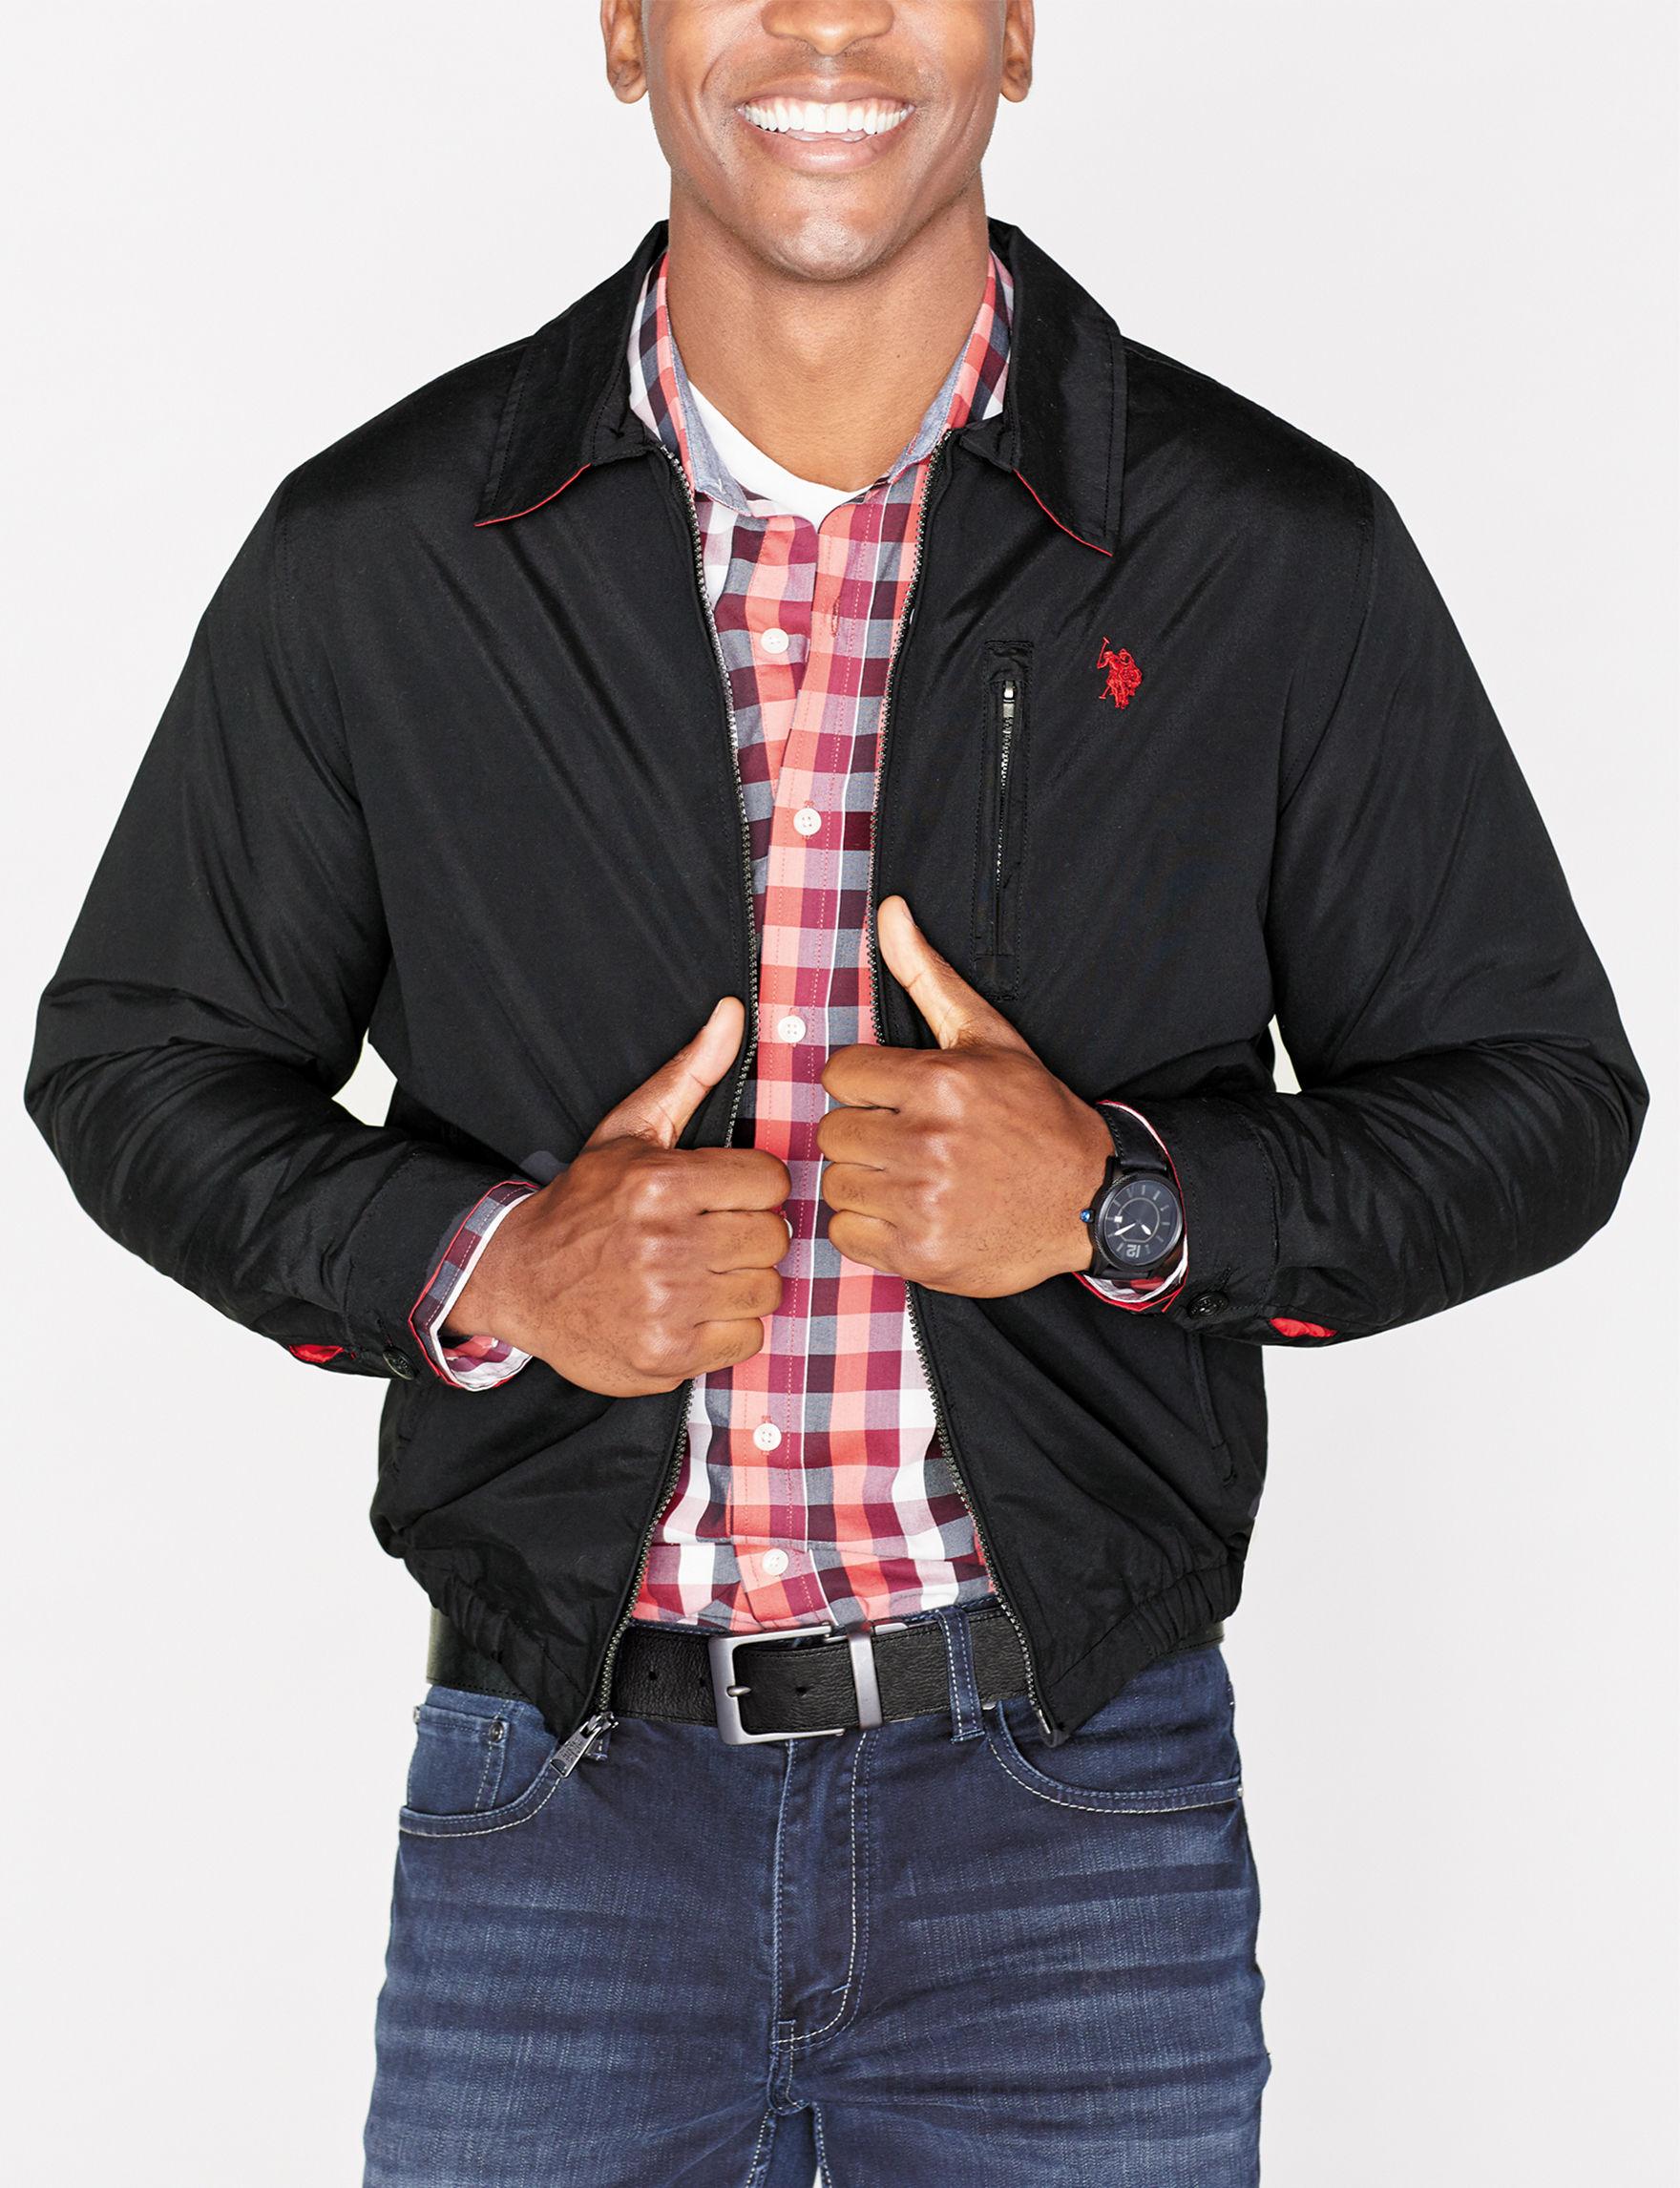 U.S. Polo Assn. Black Fleece & Soft Shell Jackets